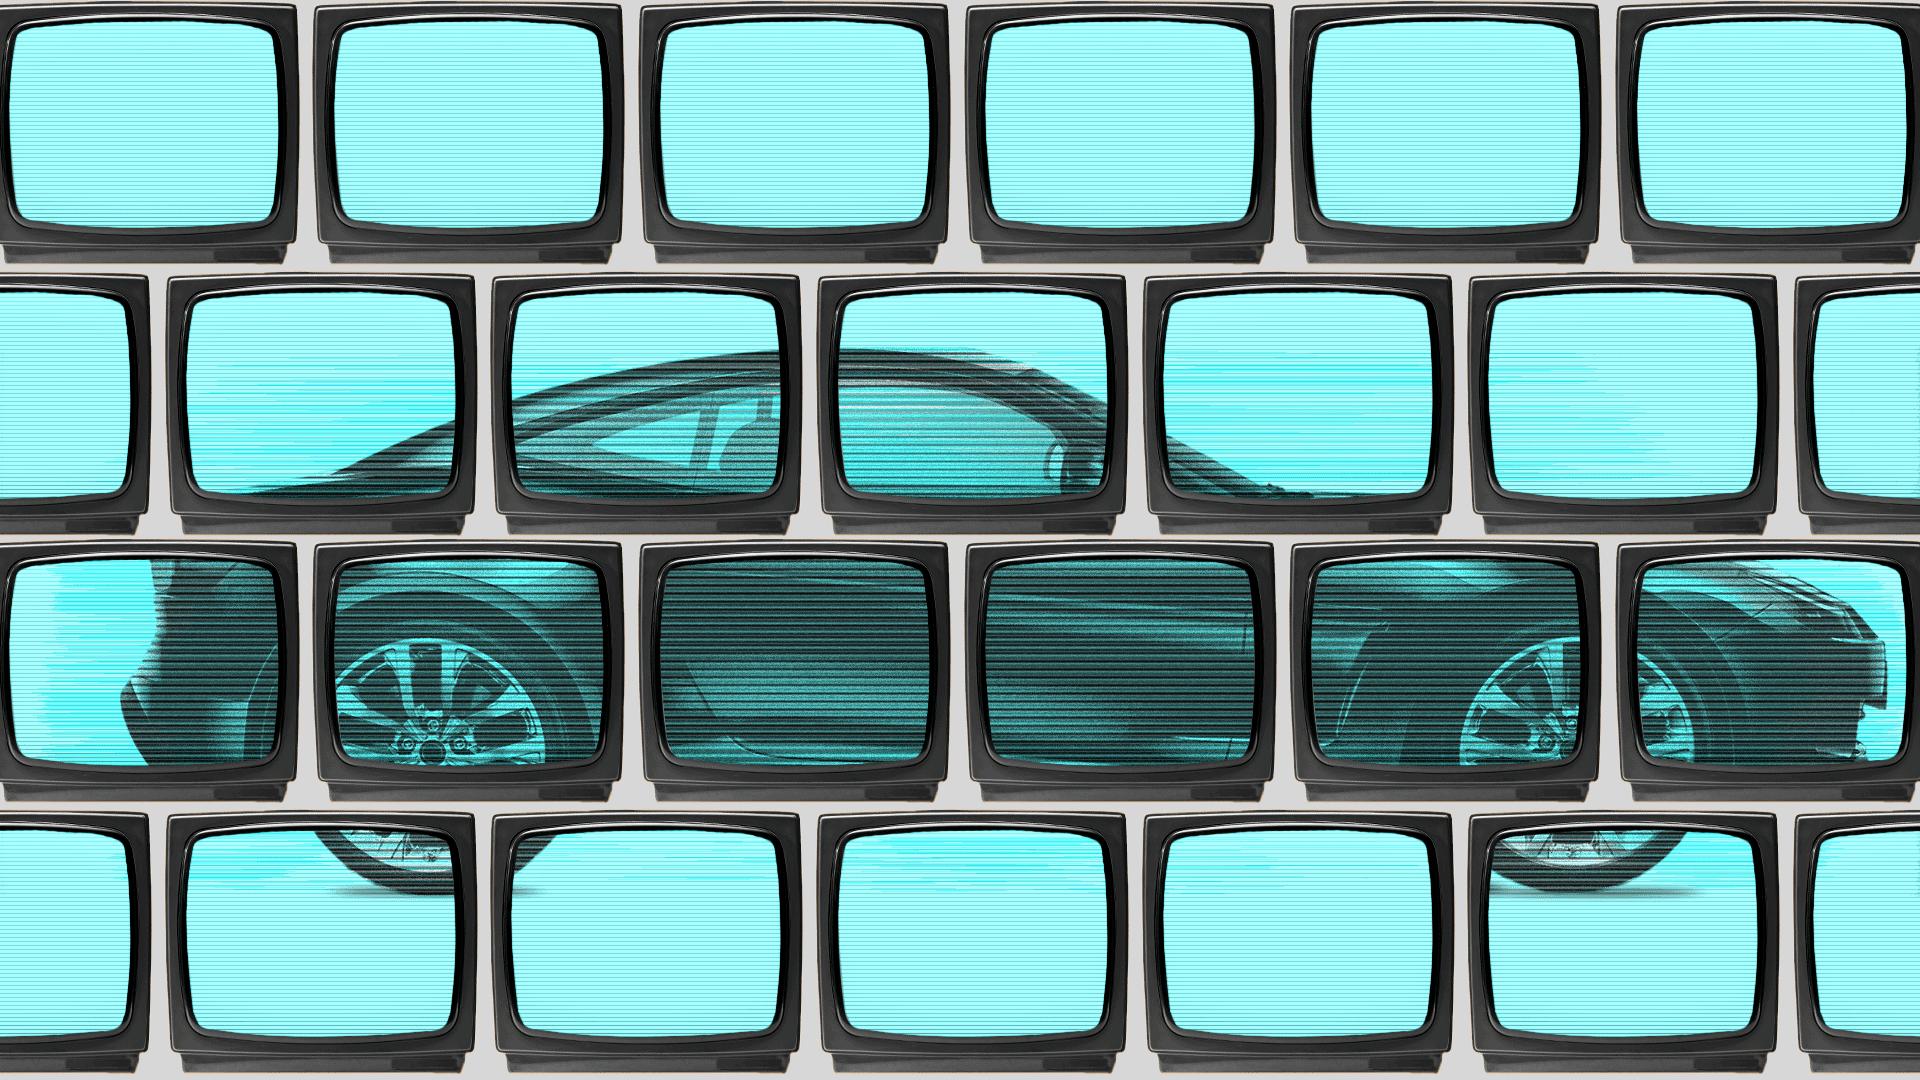 Illustration of a car on multiple tv screens